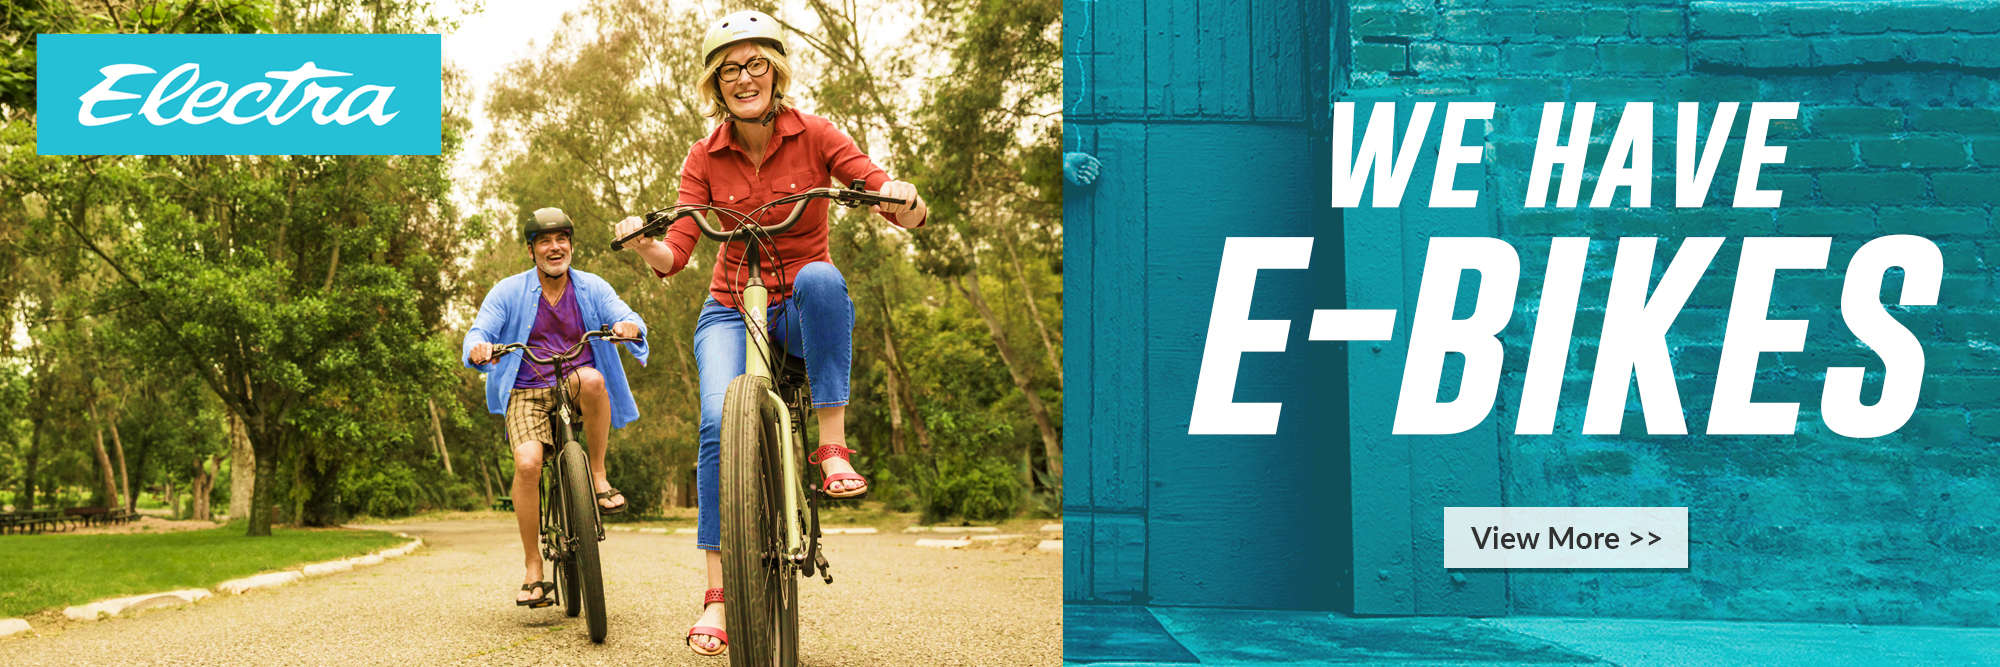 Cycle World Miami - Miami's Best Bike Shop